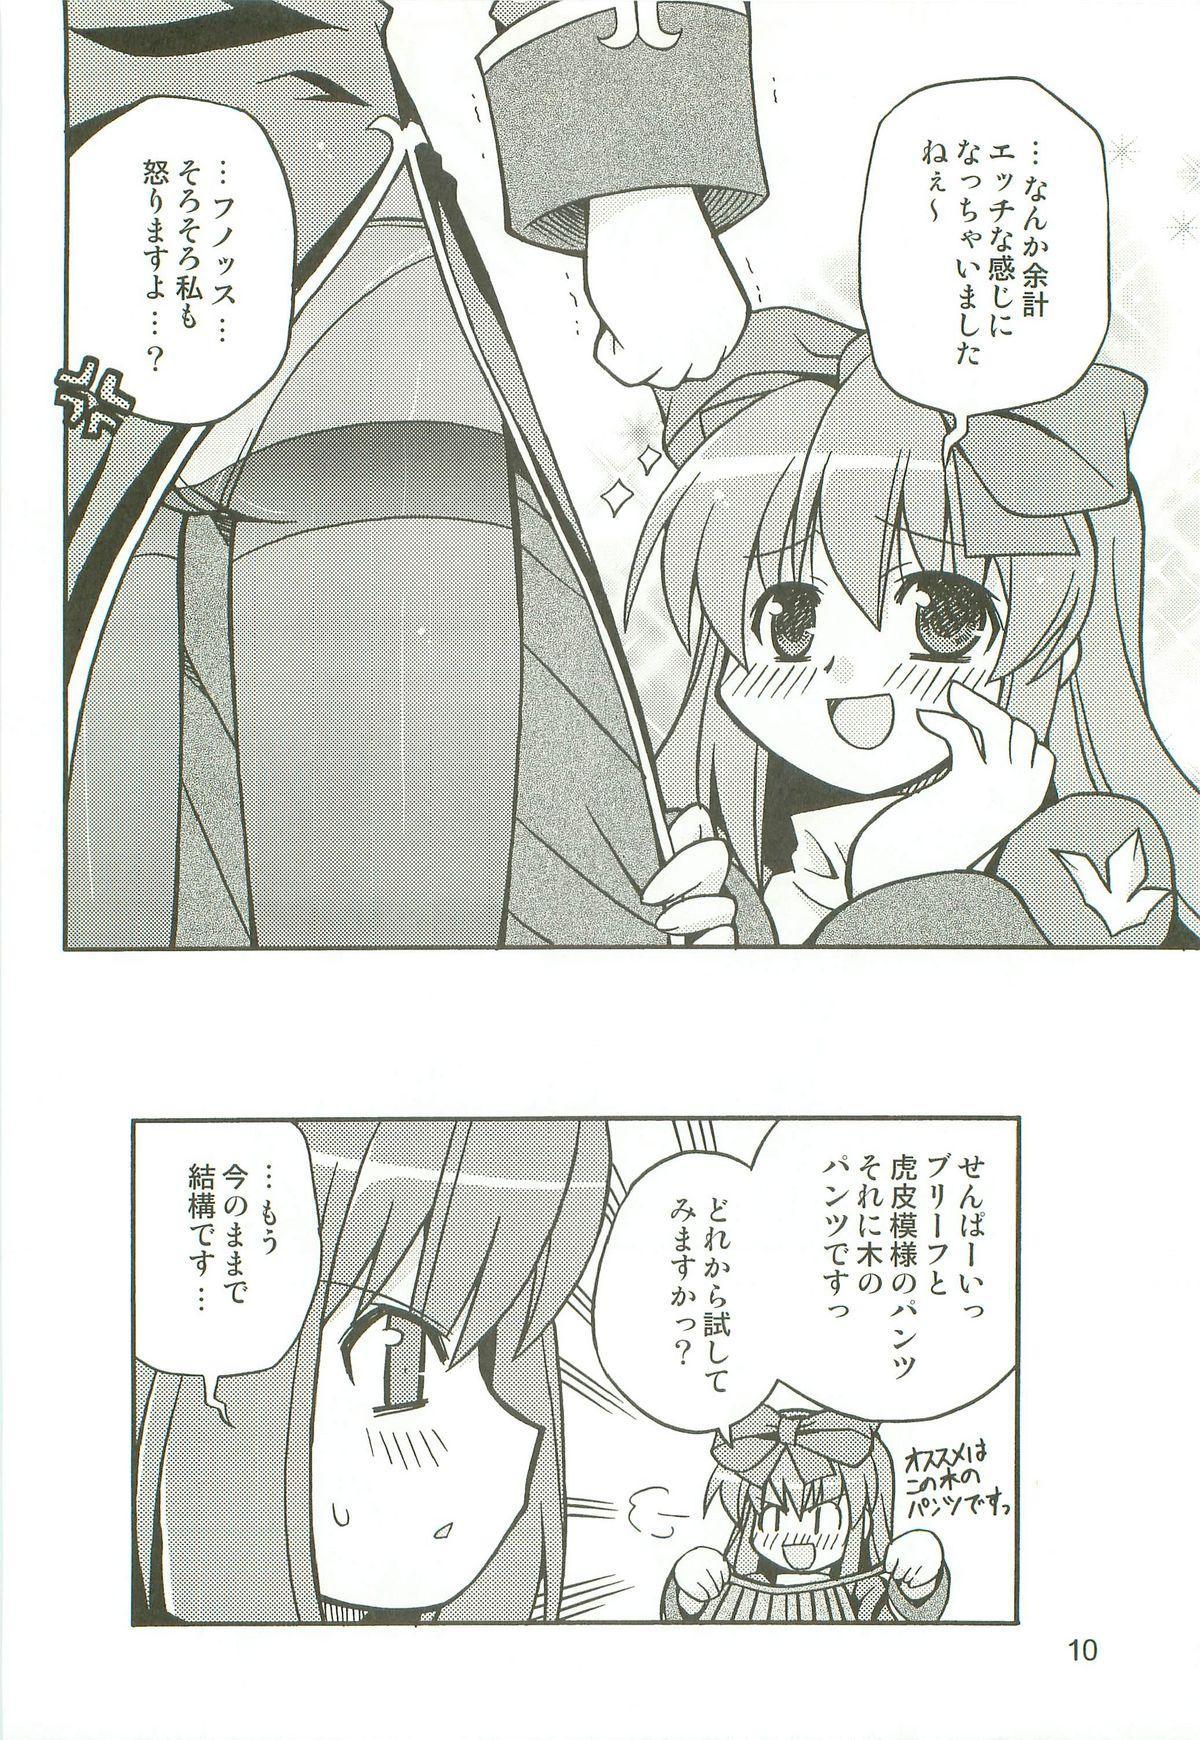 [Atelier Muse] toppatsu RO-bon naipota-sensei no chitcha kuteusui hon 8